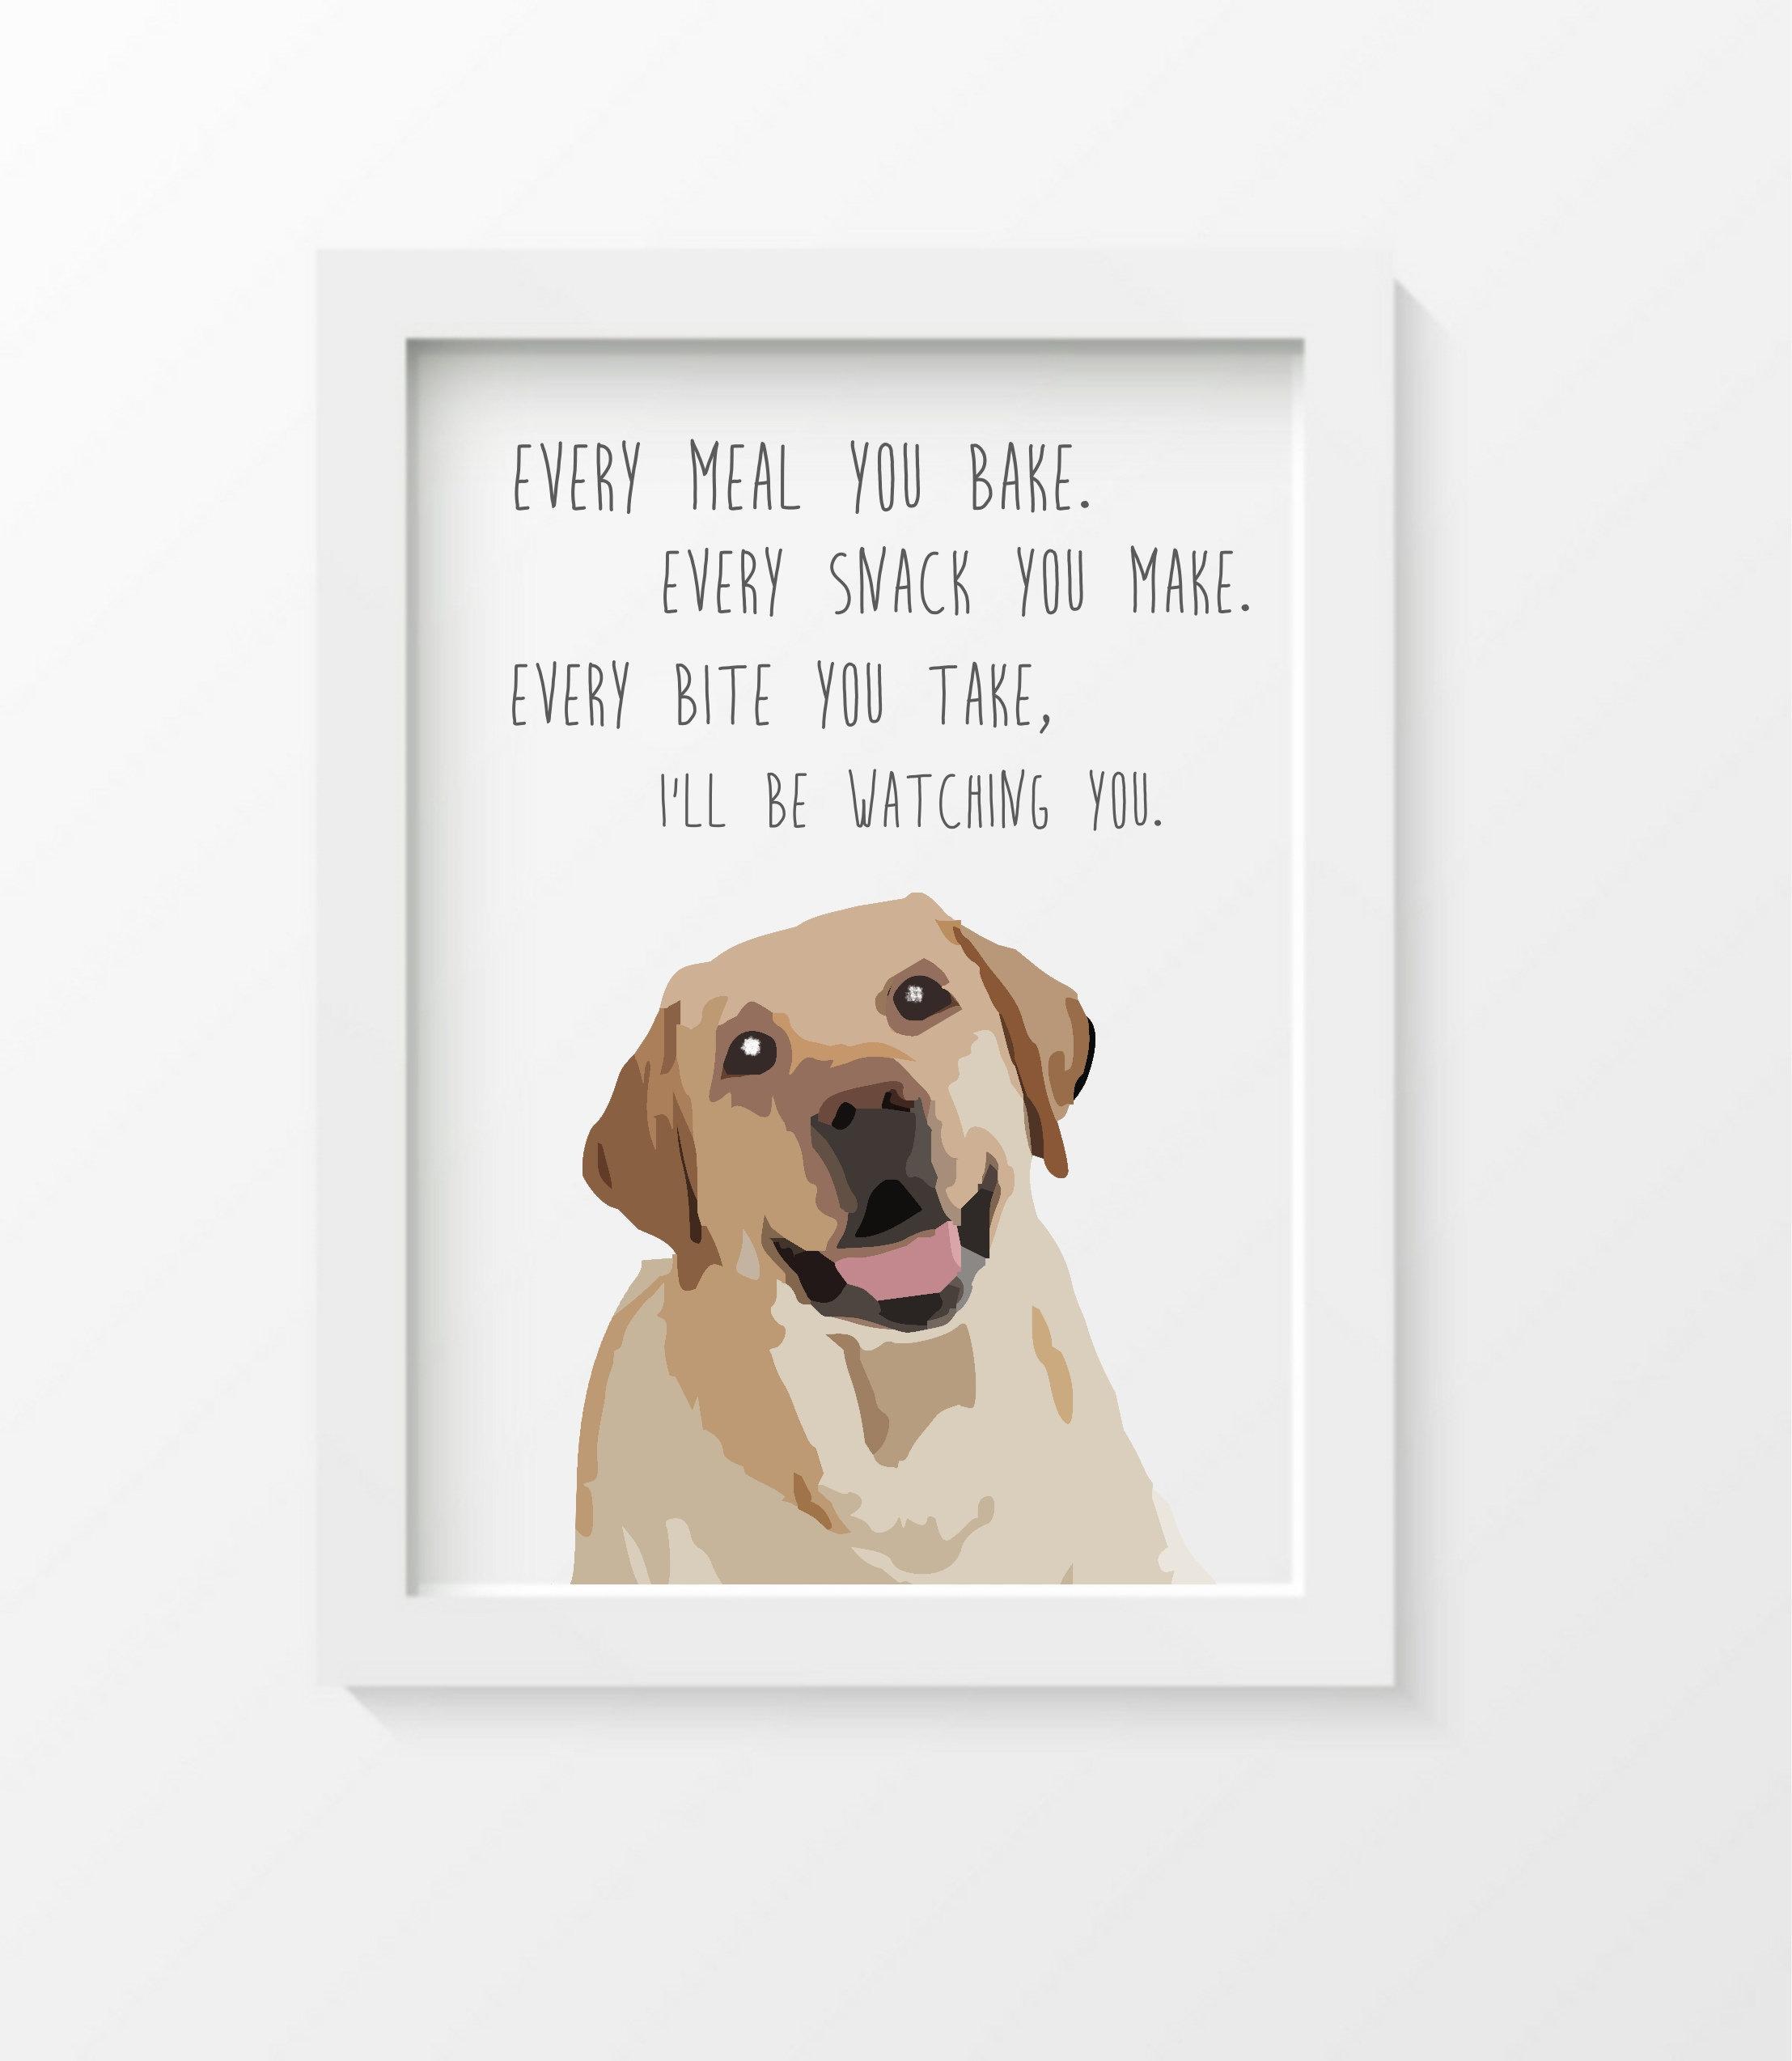 Yellow Labrador Cute Lab Puppy Dog Giclee HD Vinyl Wall Art Poster Decal Sticker